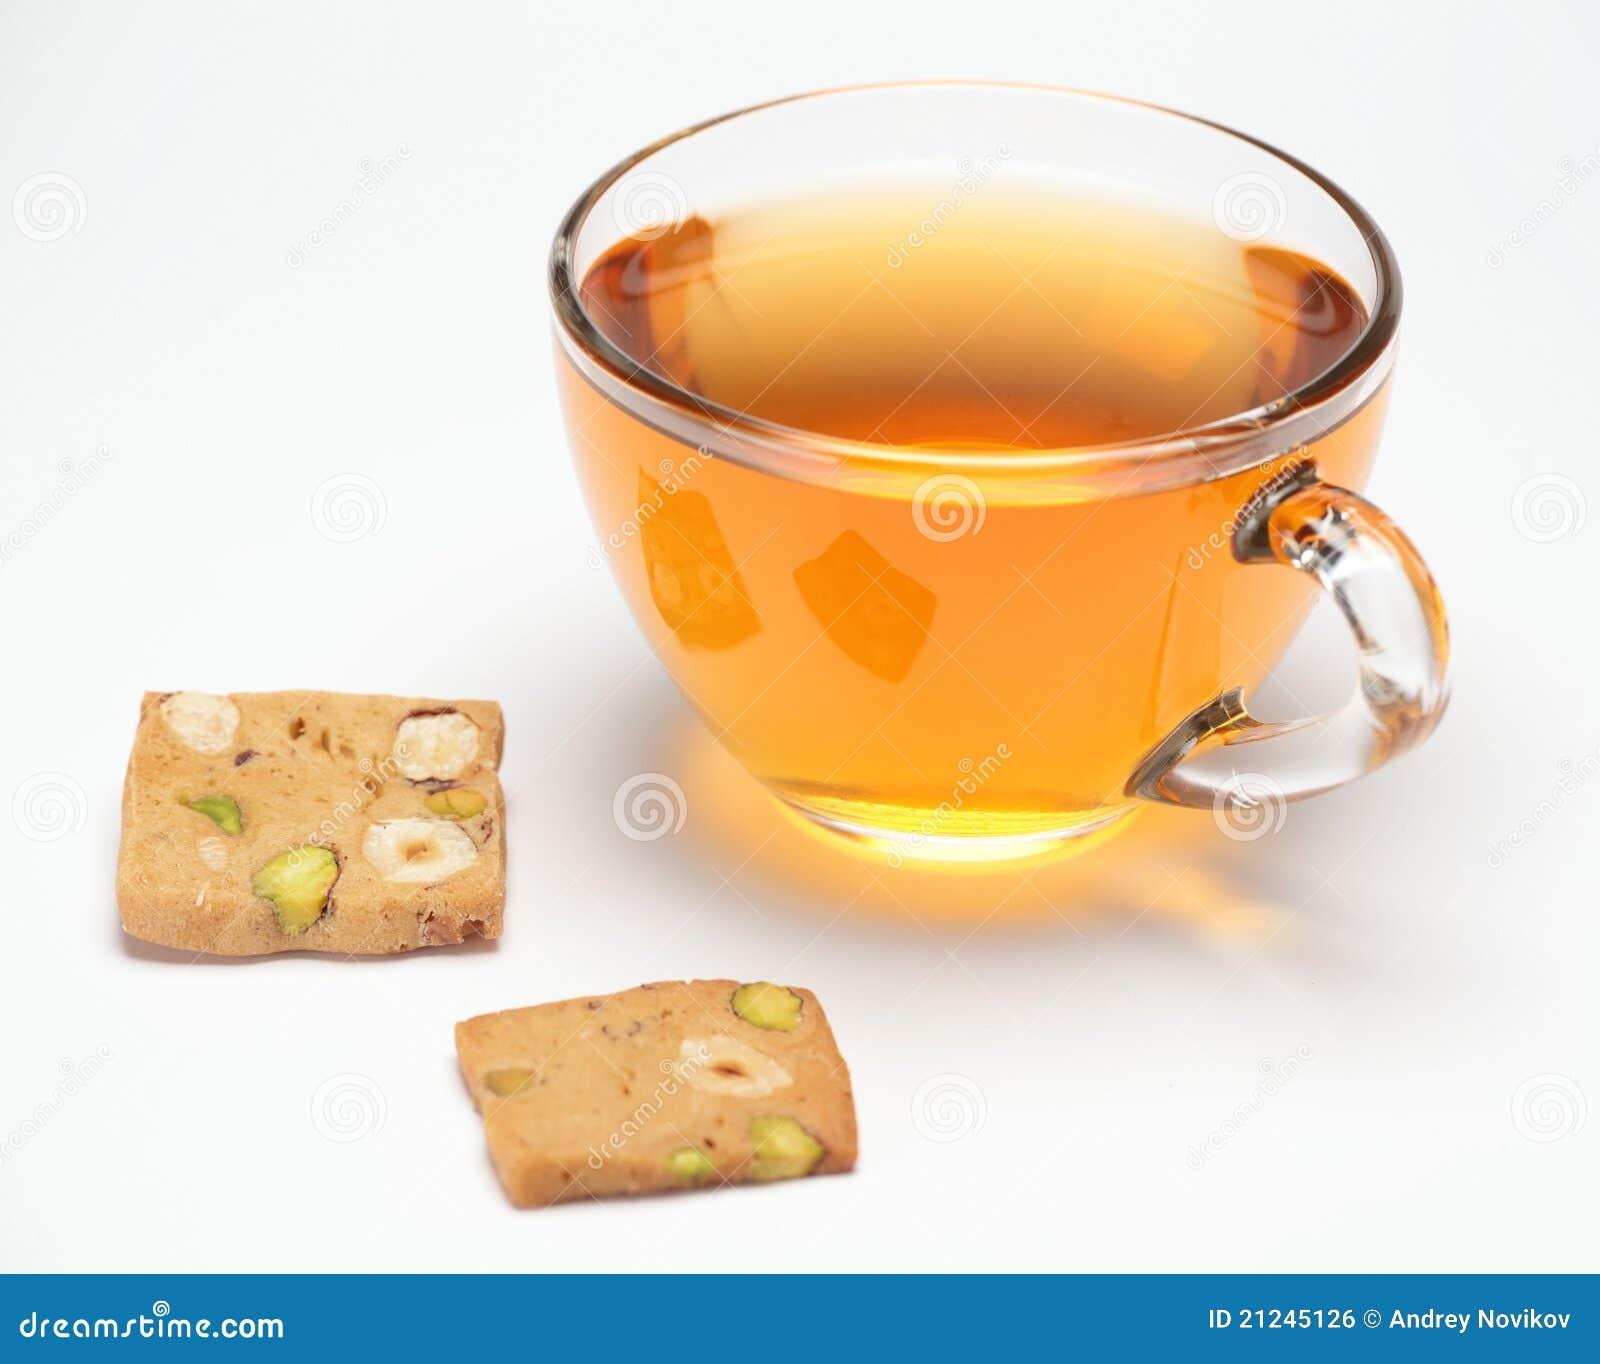 Pistachio cookies and tea